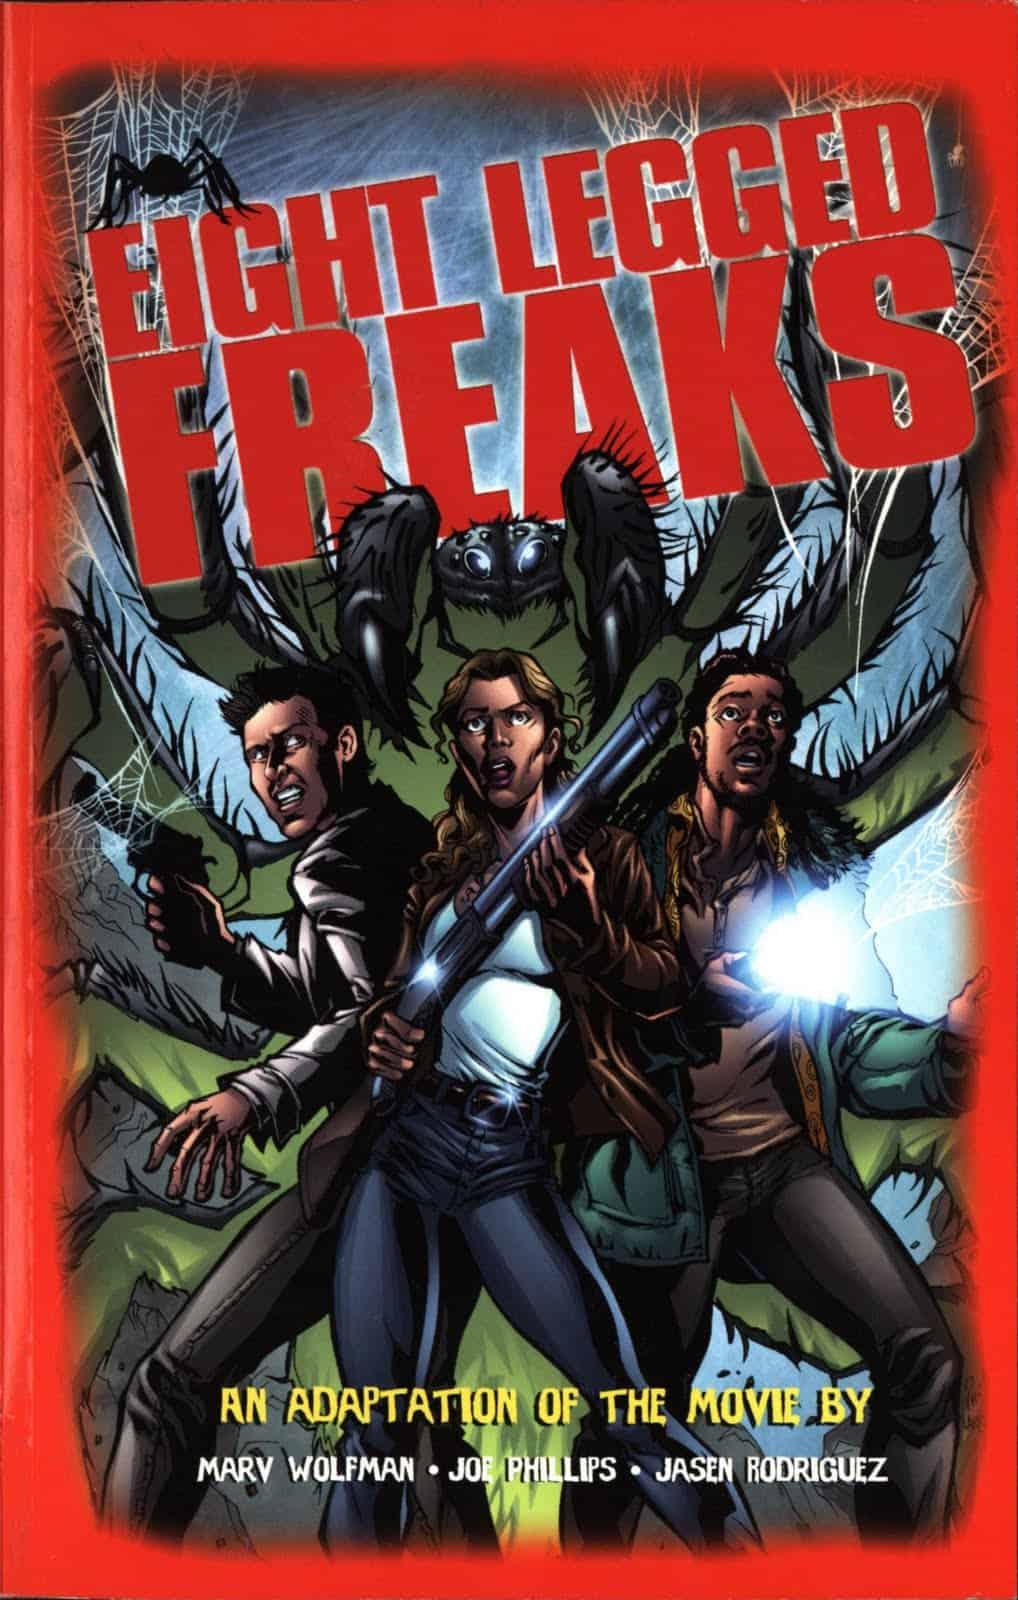 Comic: Eight Legged Freaks